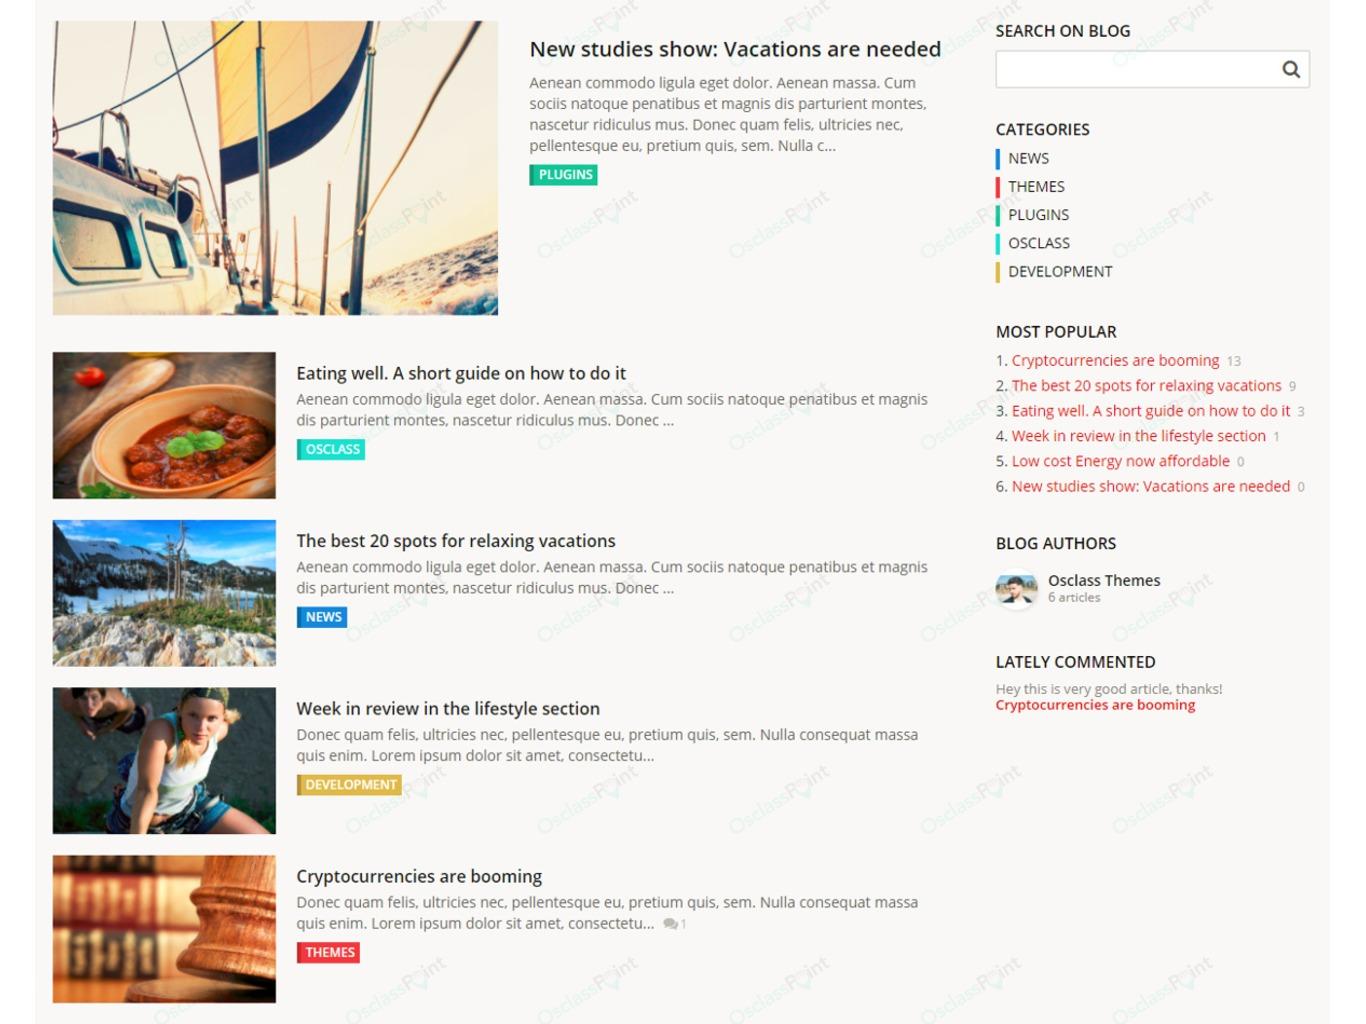 Osclass Blog and News Plugin - Messaging and Communication - Osclass plugins